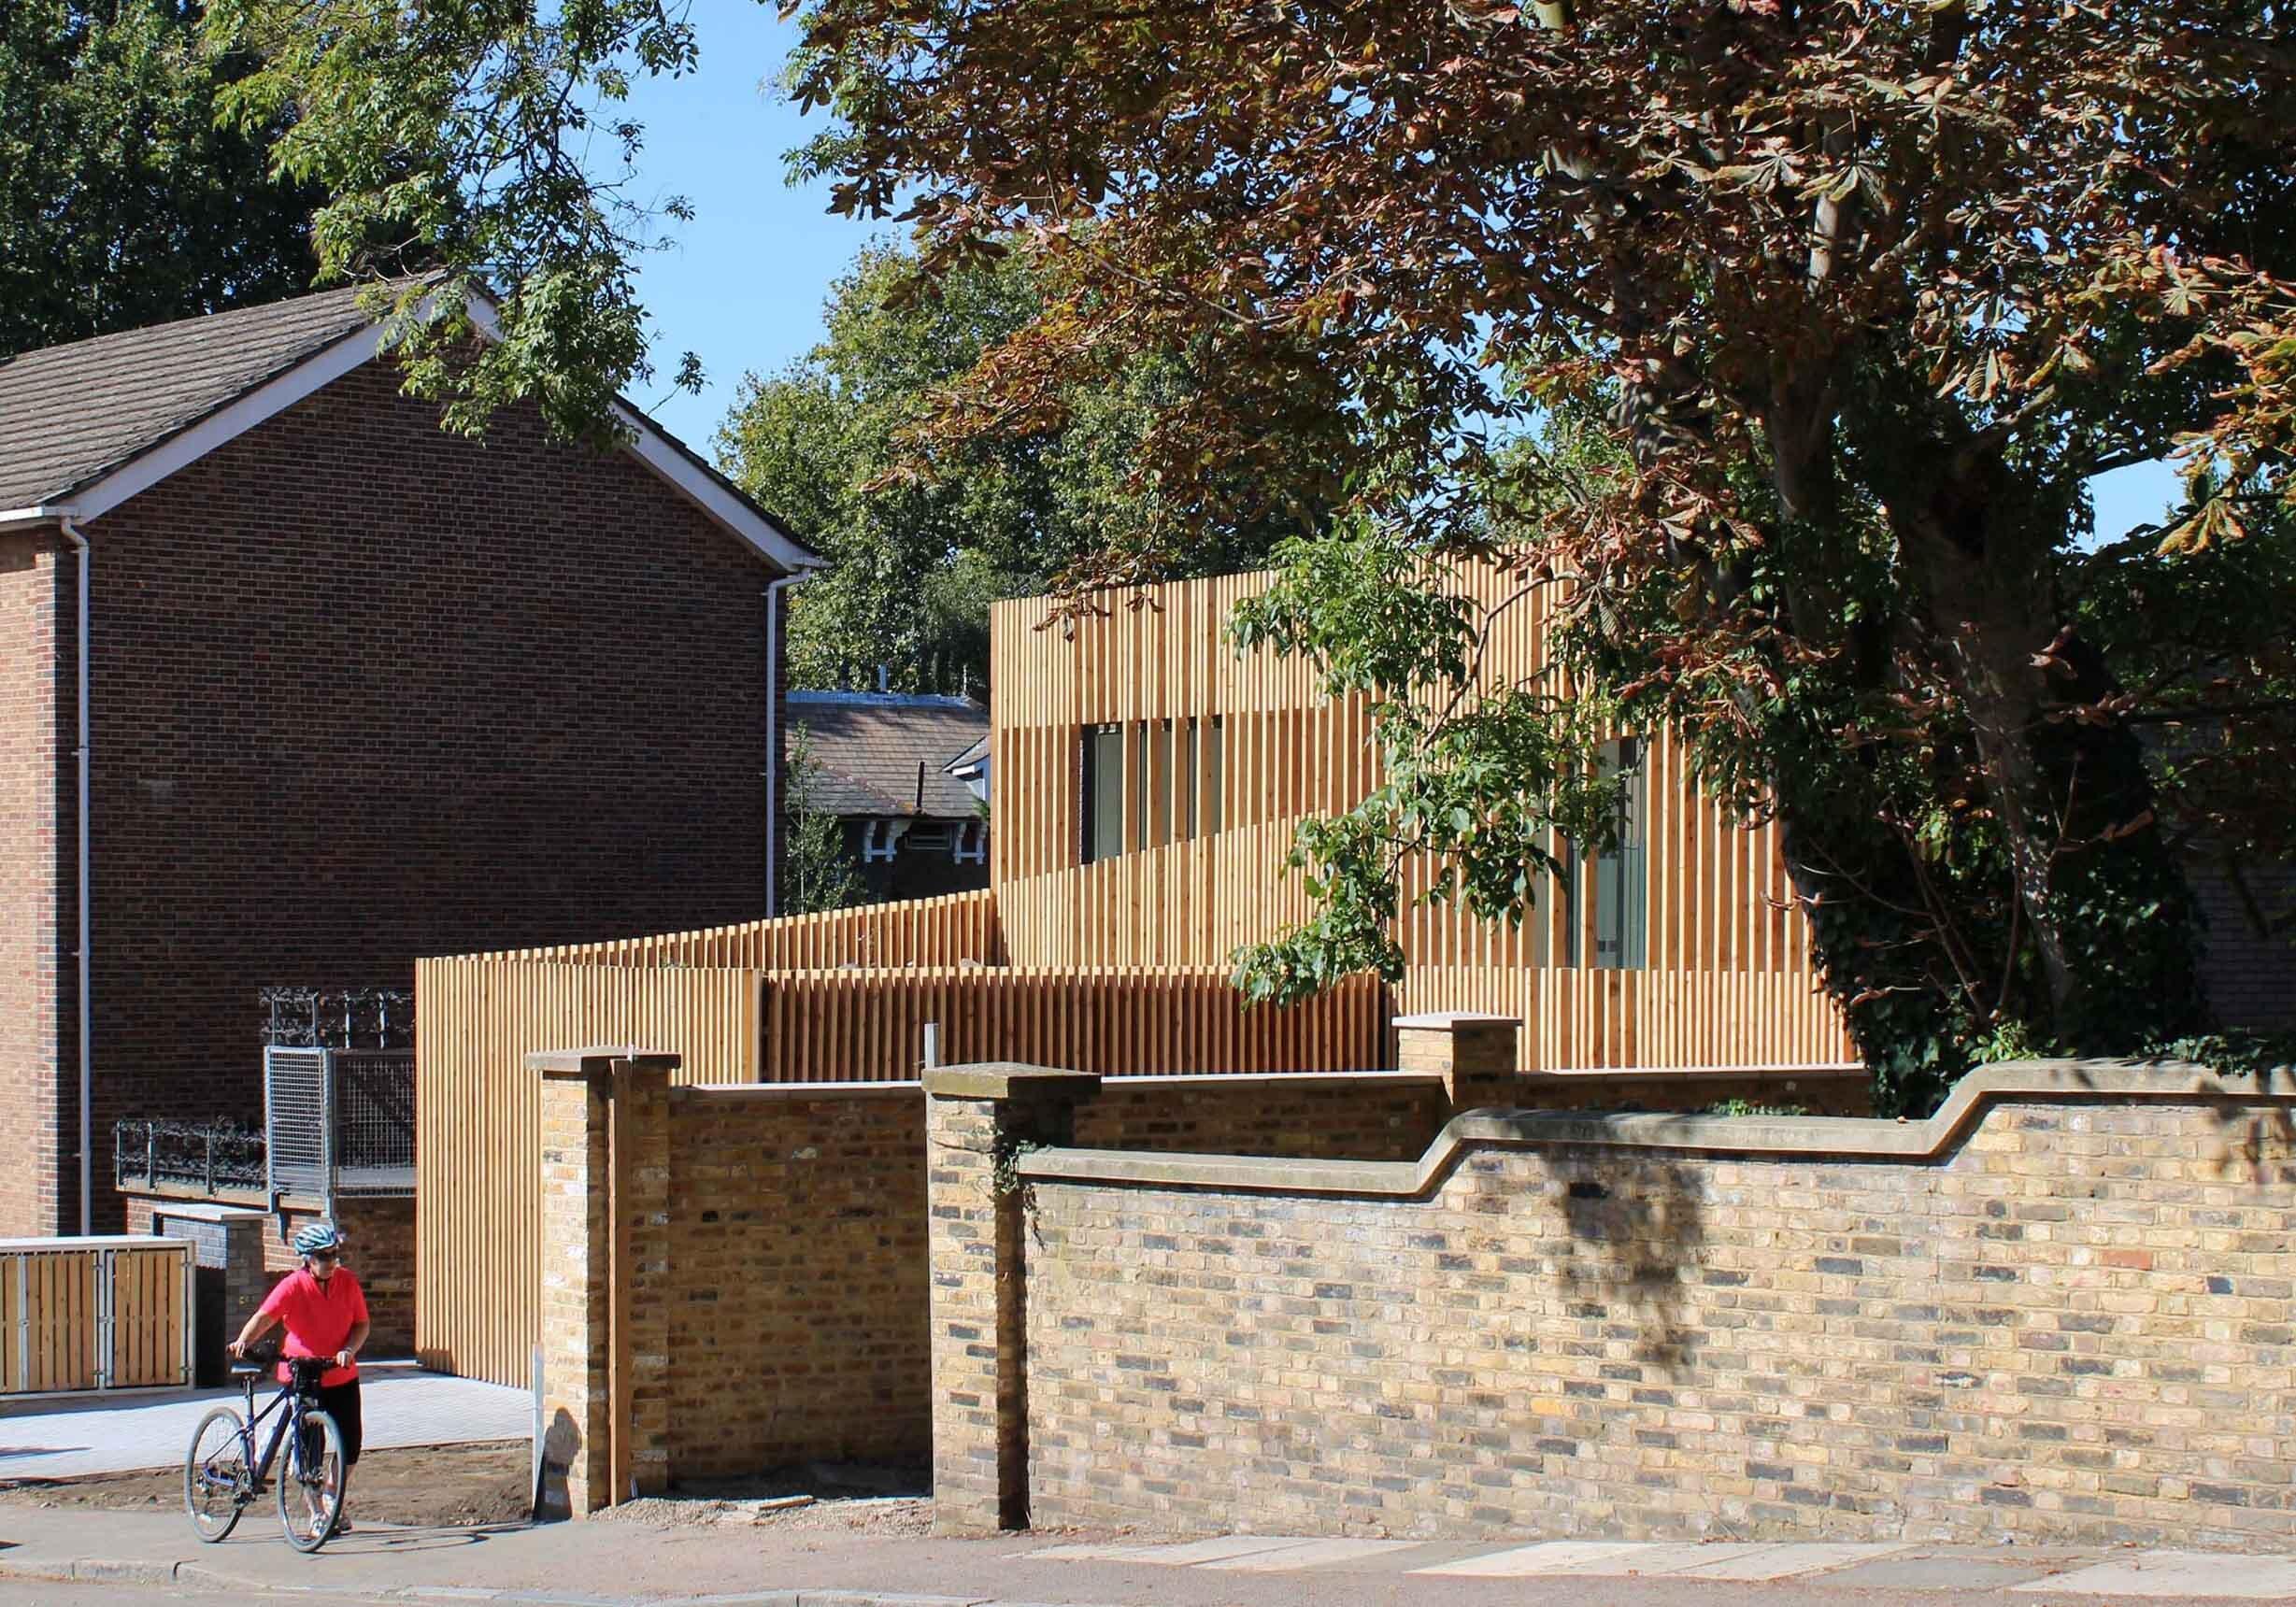 Amoreira, new build in Blackheath, Lewisham built by Apex Architecture's London team.